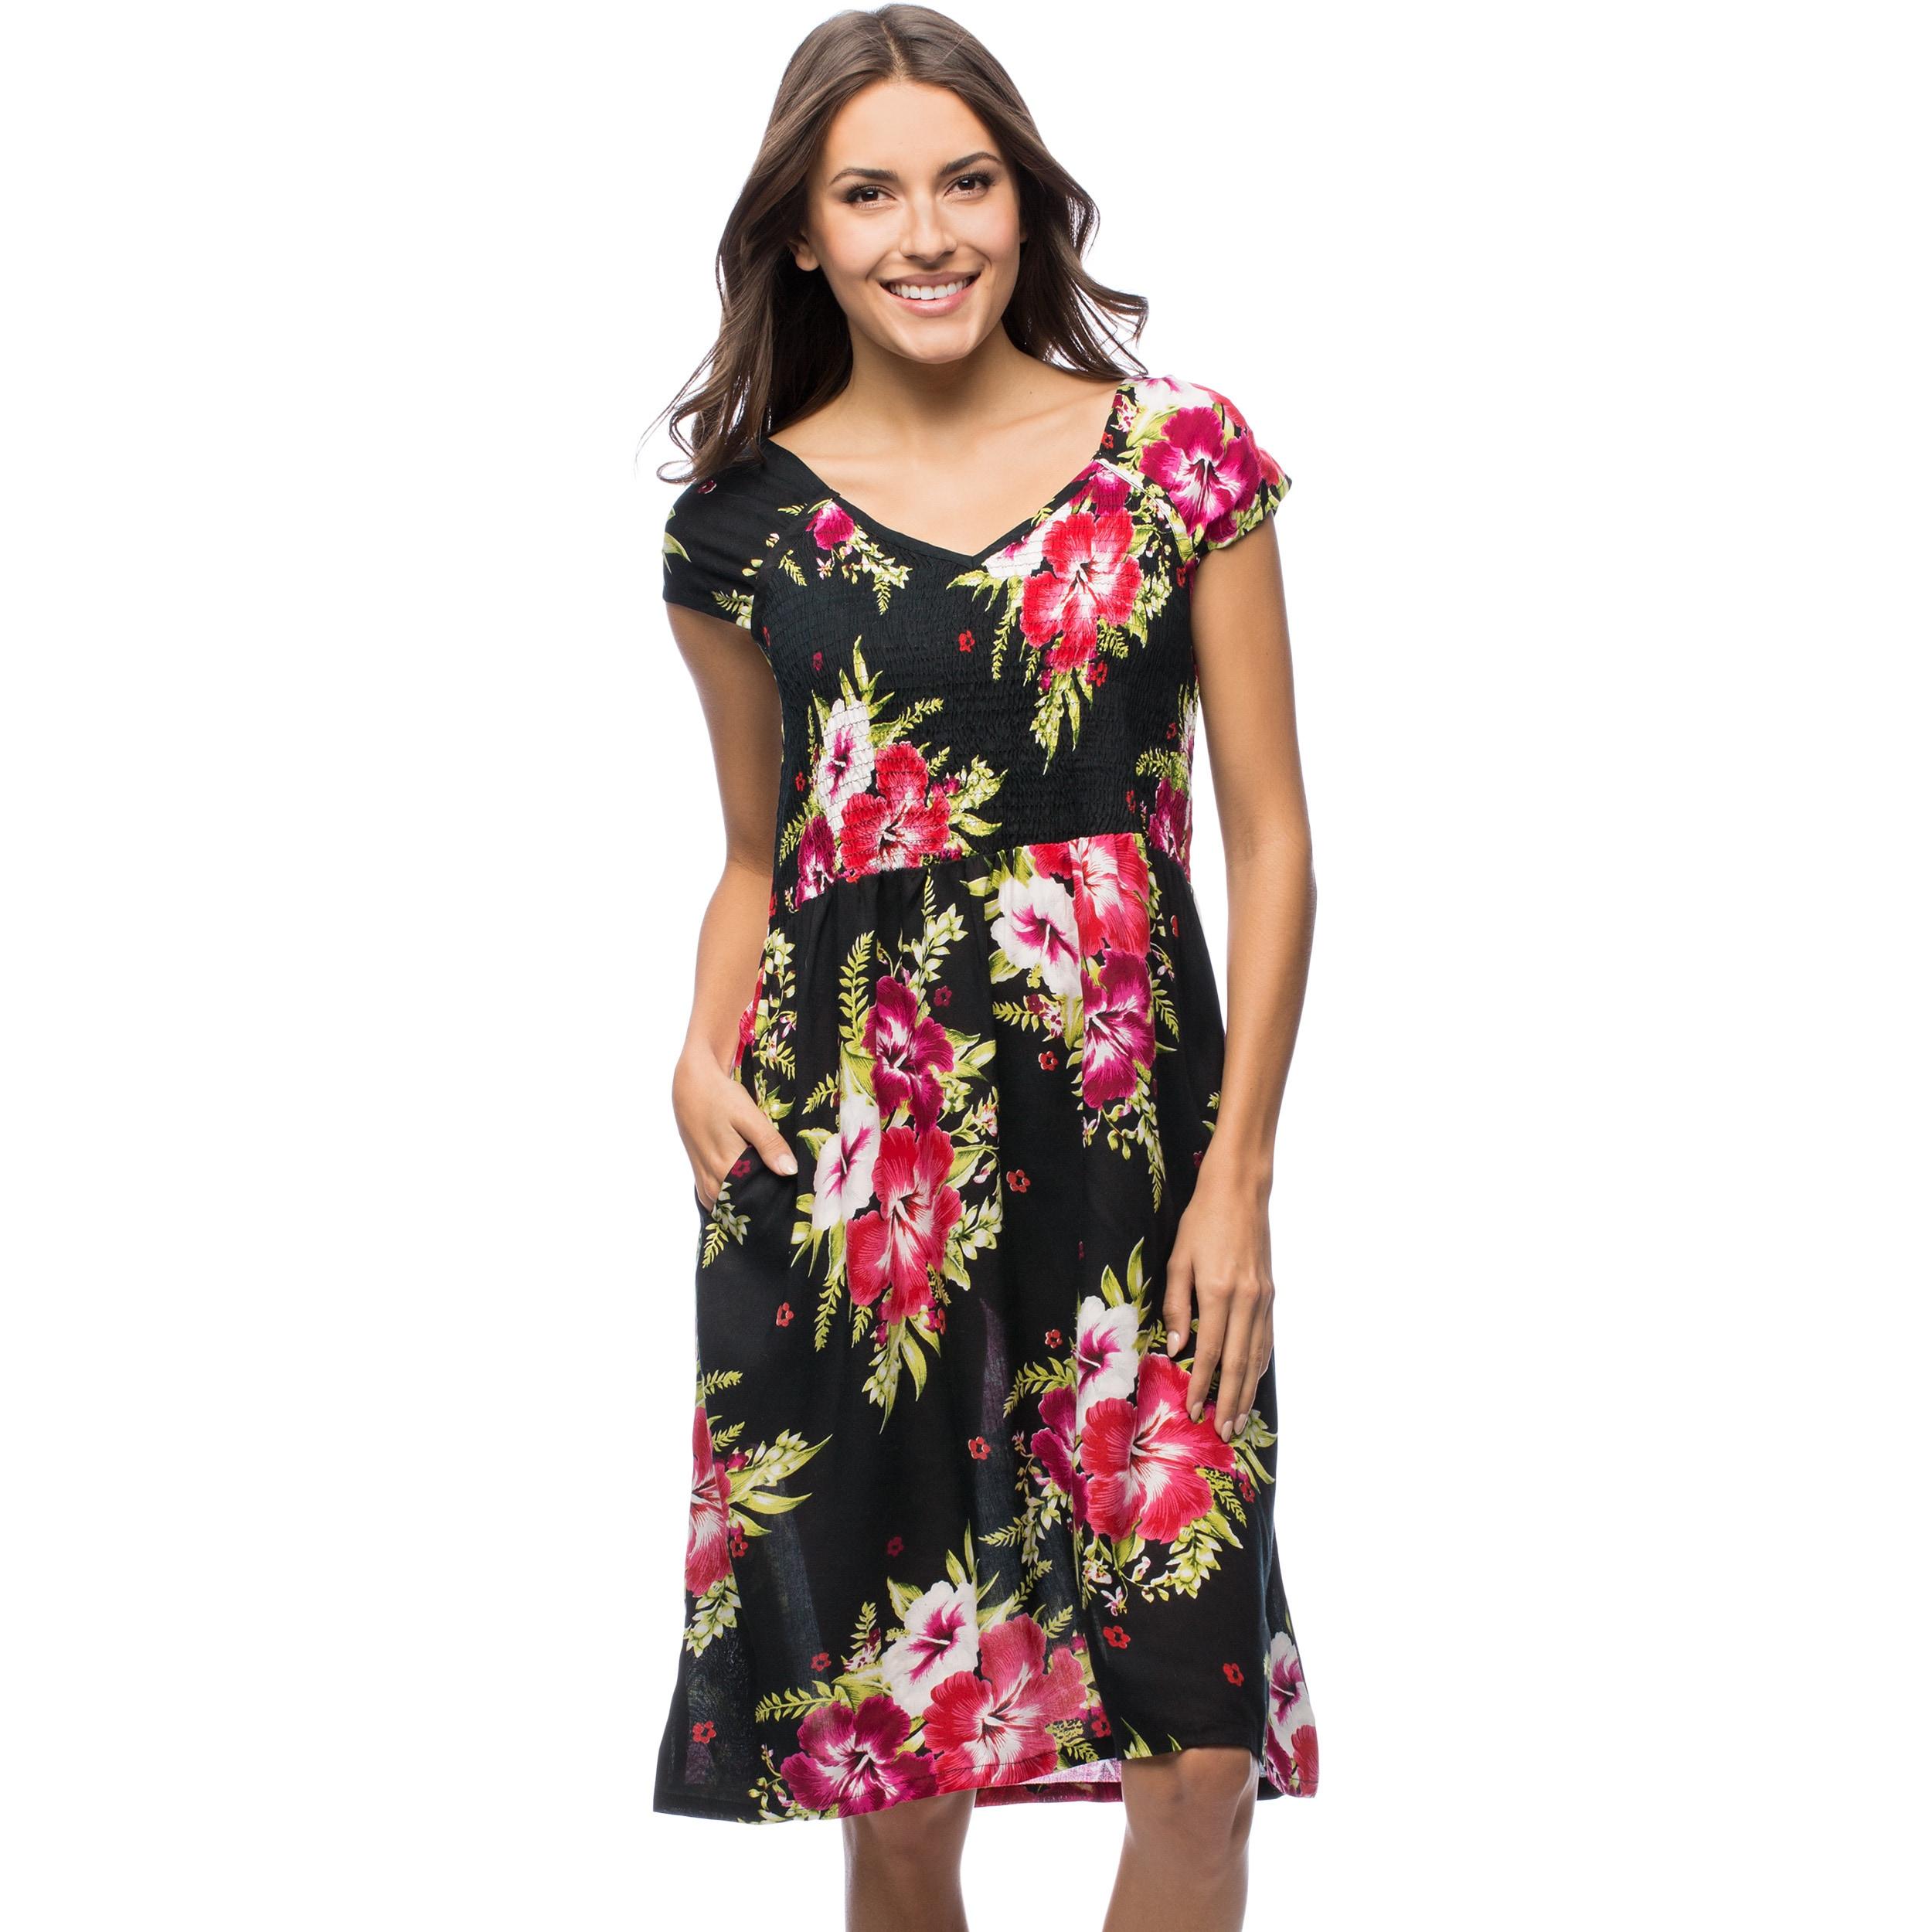 021afa9475e32 Shop La Cera Women s Smocked-Bodice Sleeveless Floral Sundress - Free  Shipping Today - Overstock - 7026482